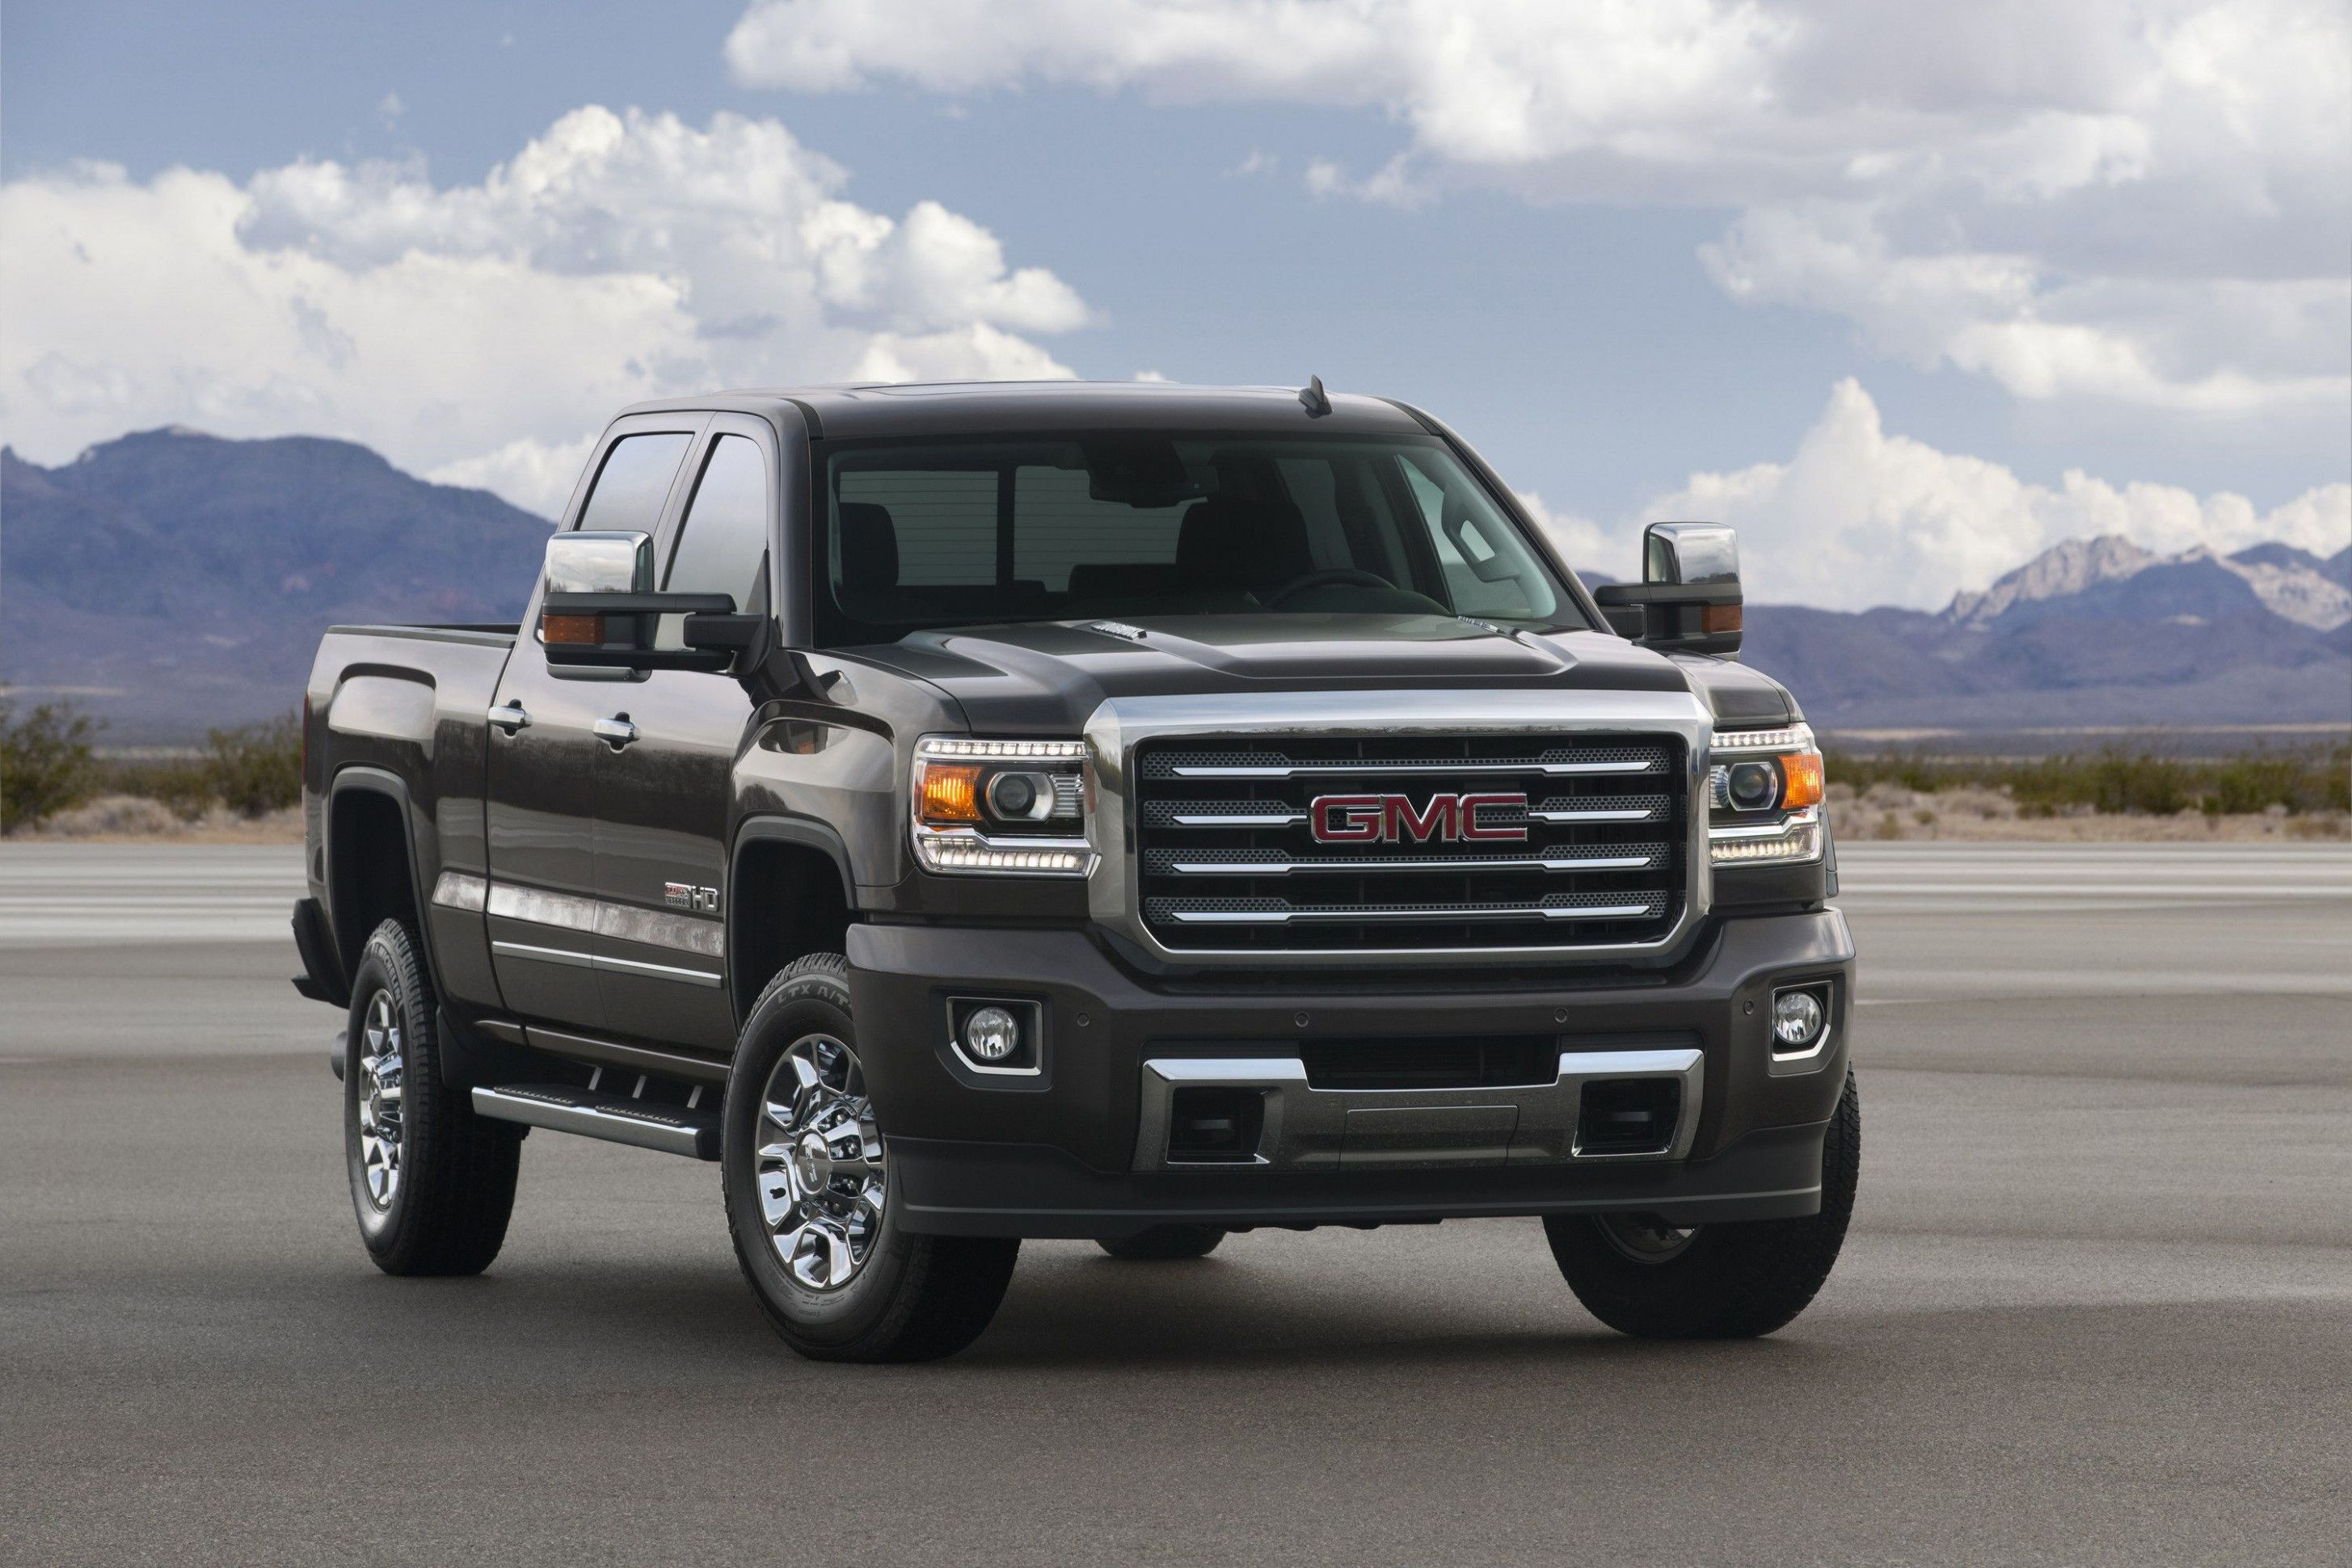 2020 Gmc Lifted Trucks Configurations 2020 Car Reviews Gmc Trucks Pickup Trucks Gmc Denali